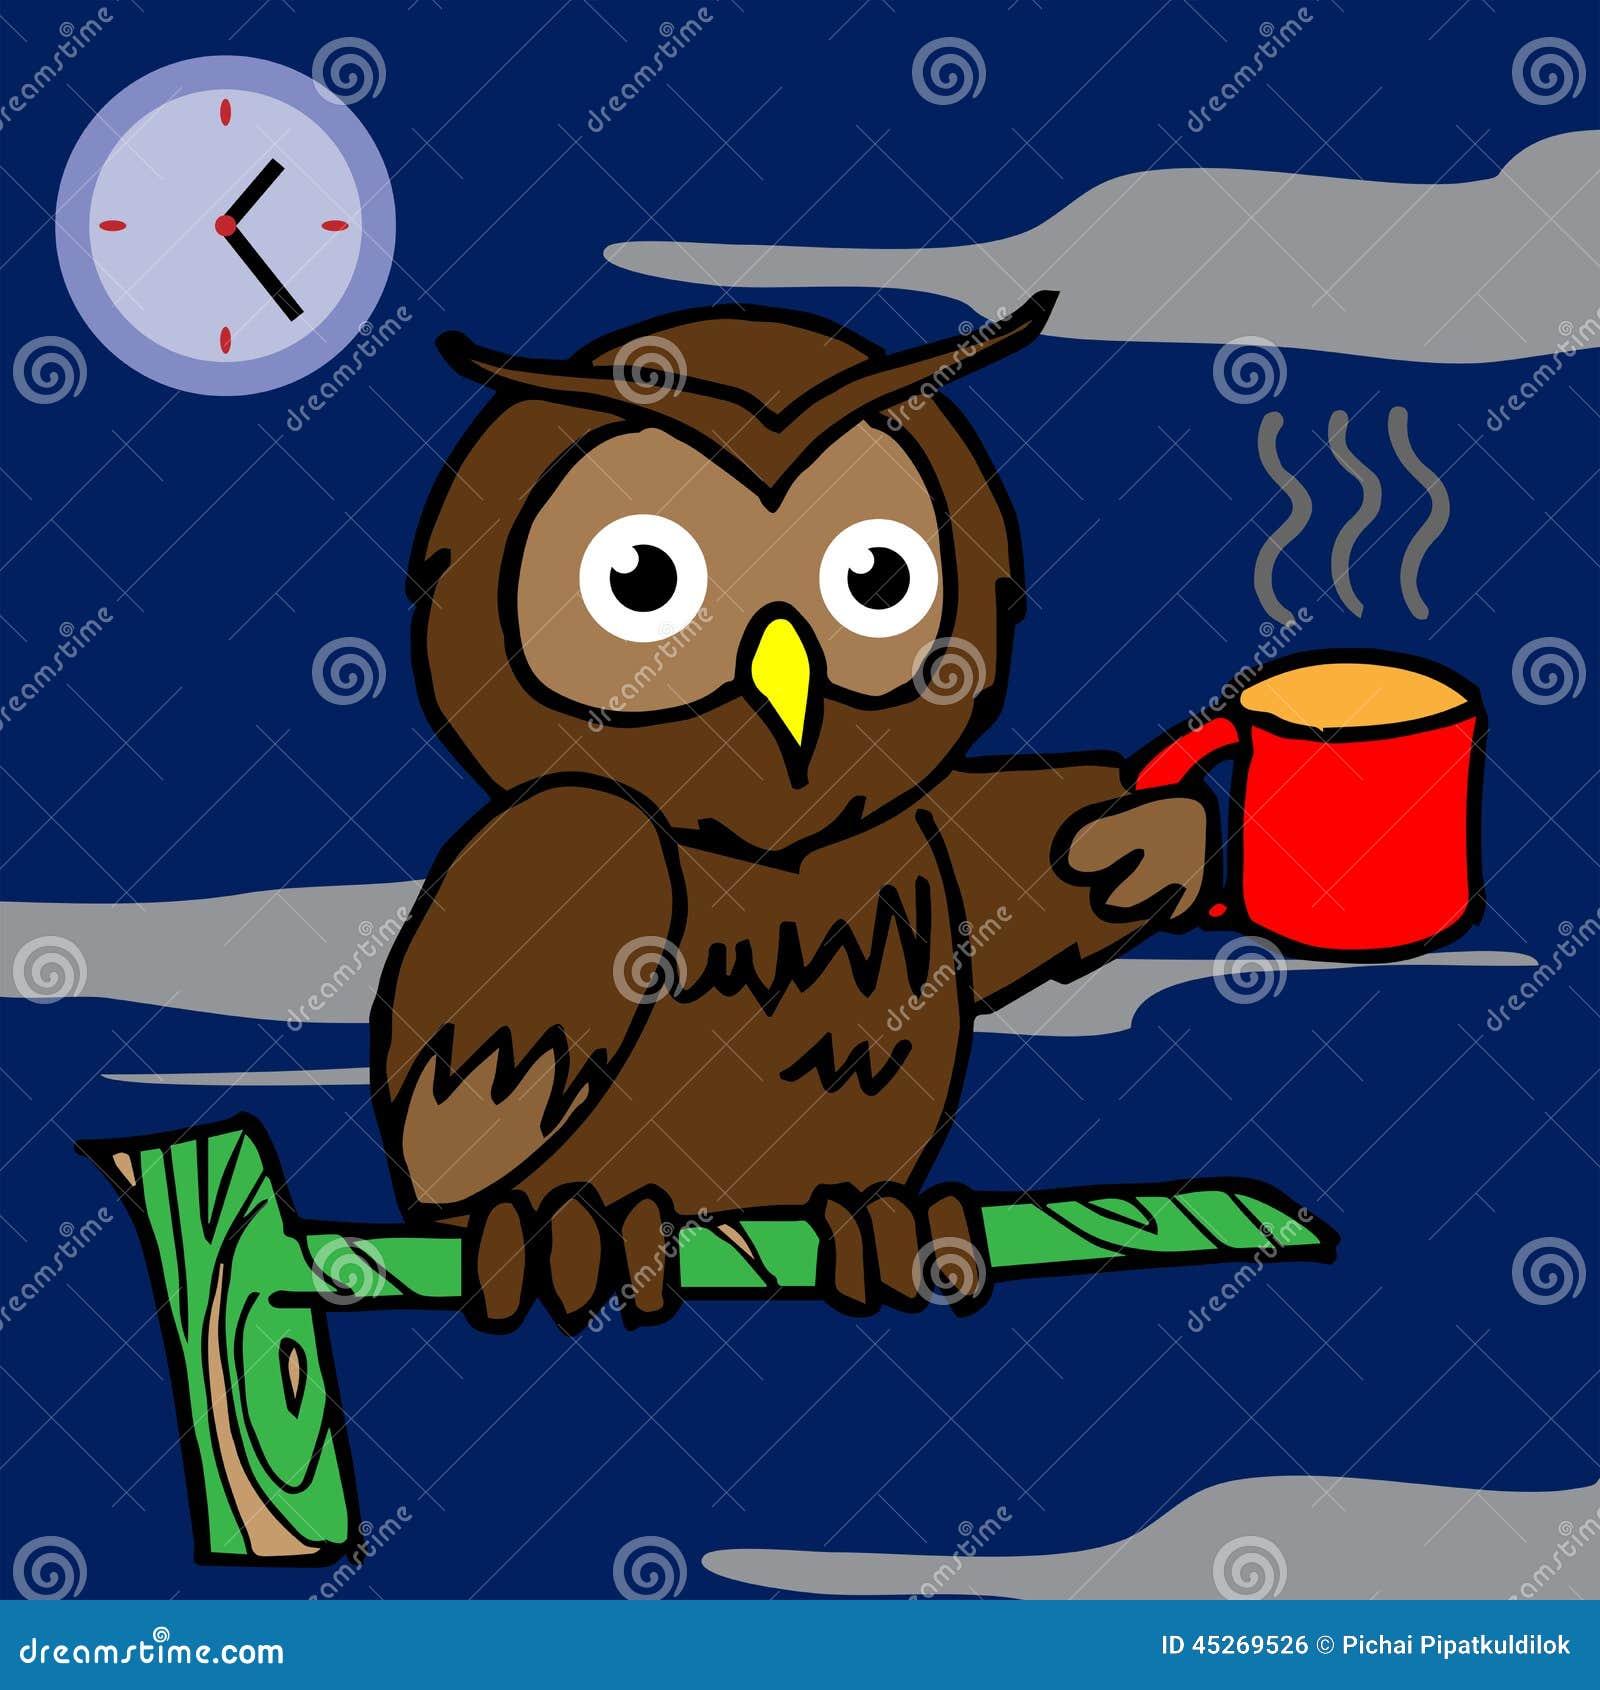 Owl drinking coffee and cant sleep